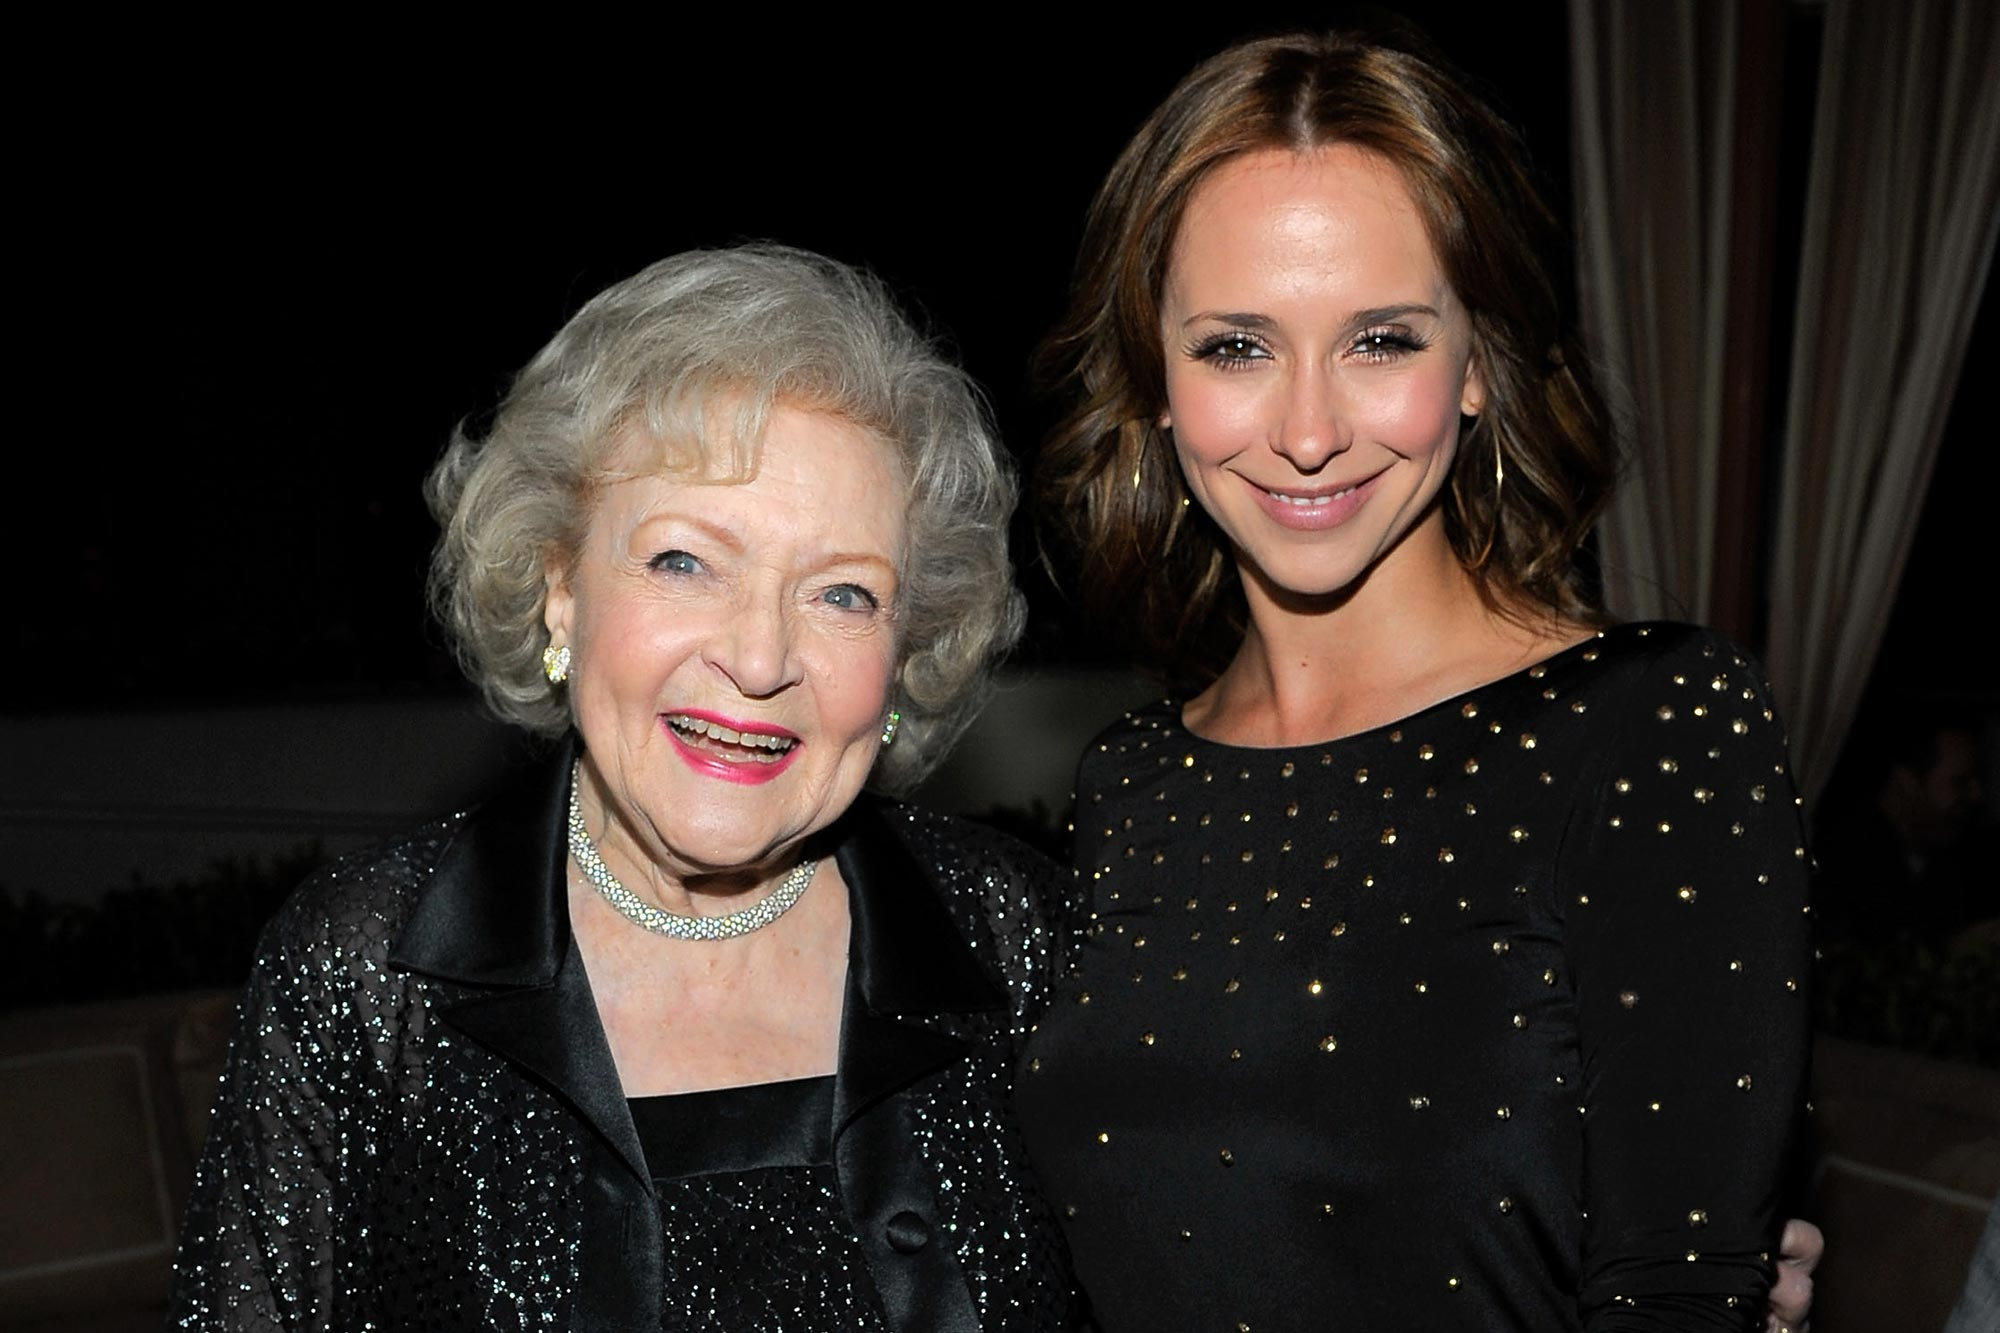 Betty White (L) and Jennifer Love Hewitt